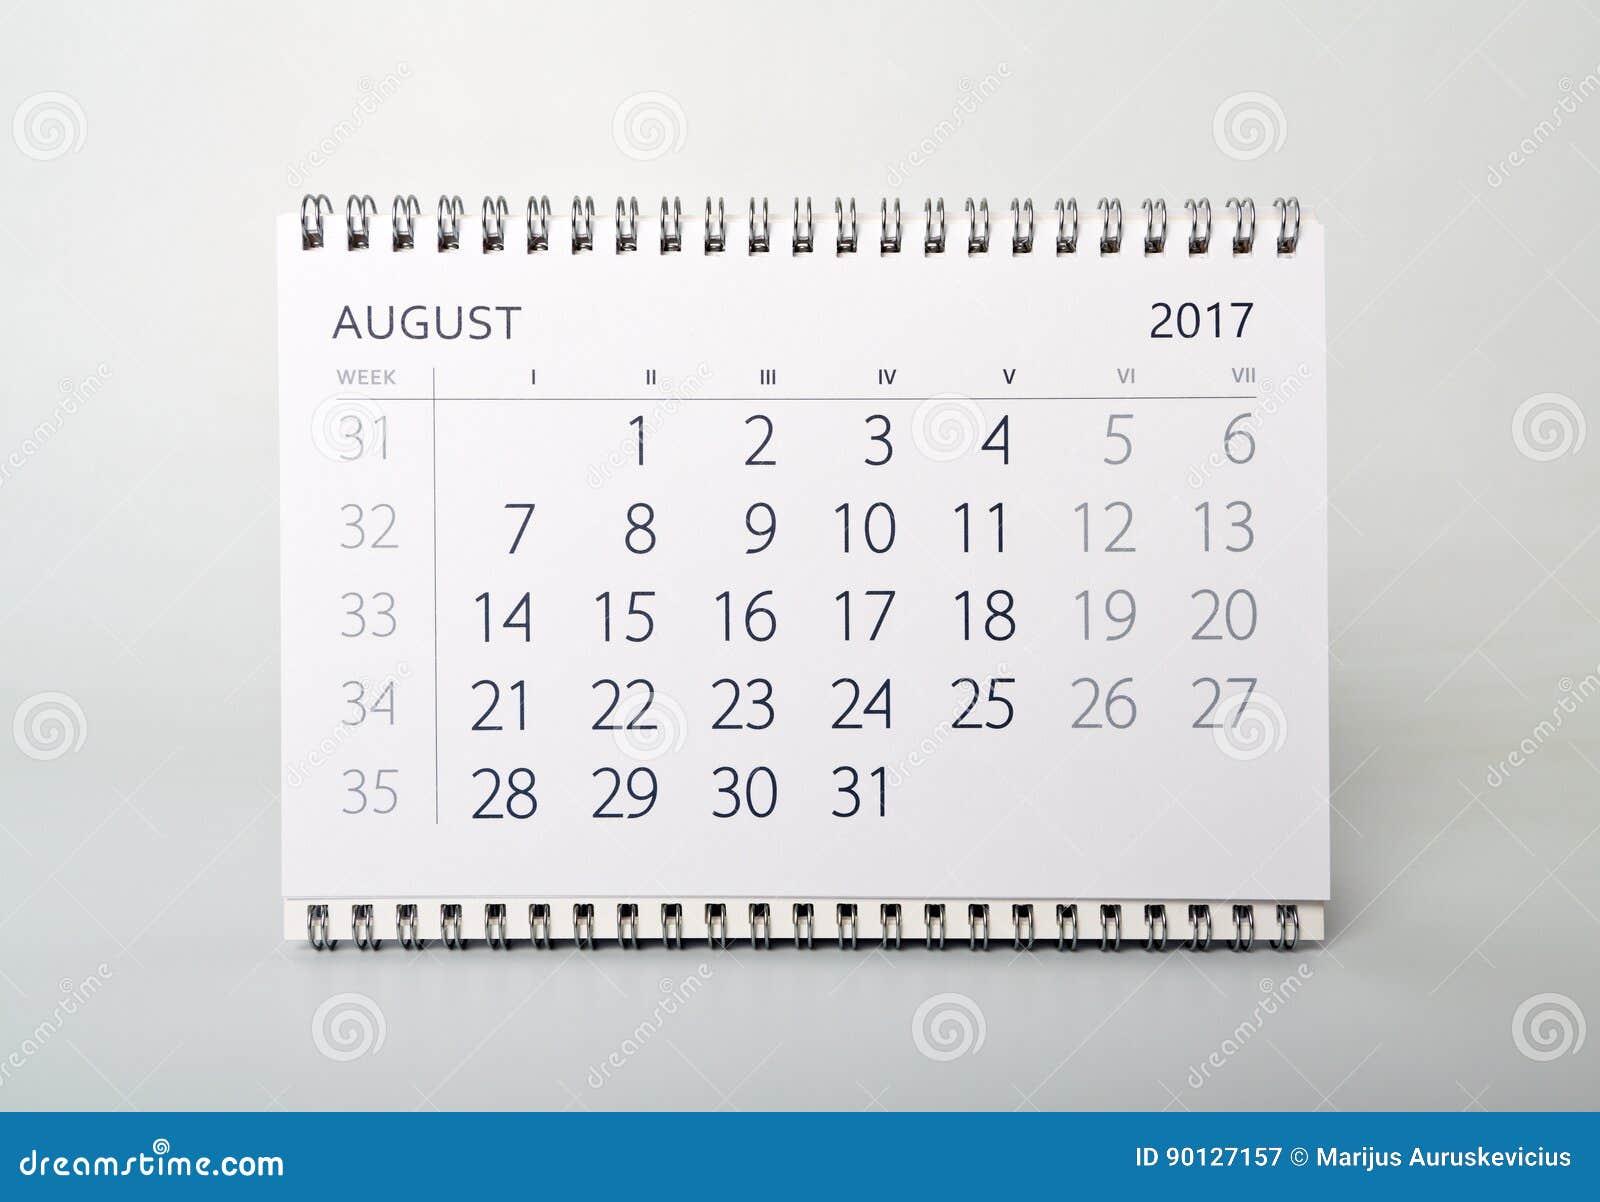 Sju Calendar.August Calendar Av Aret Tvatusen Sjutton Fotografering For